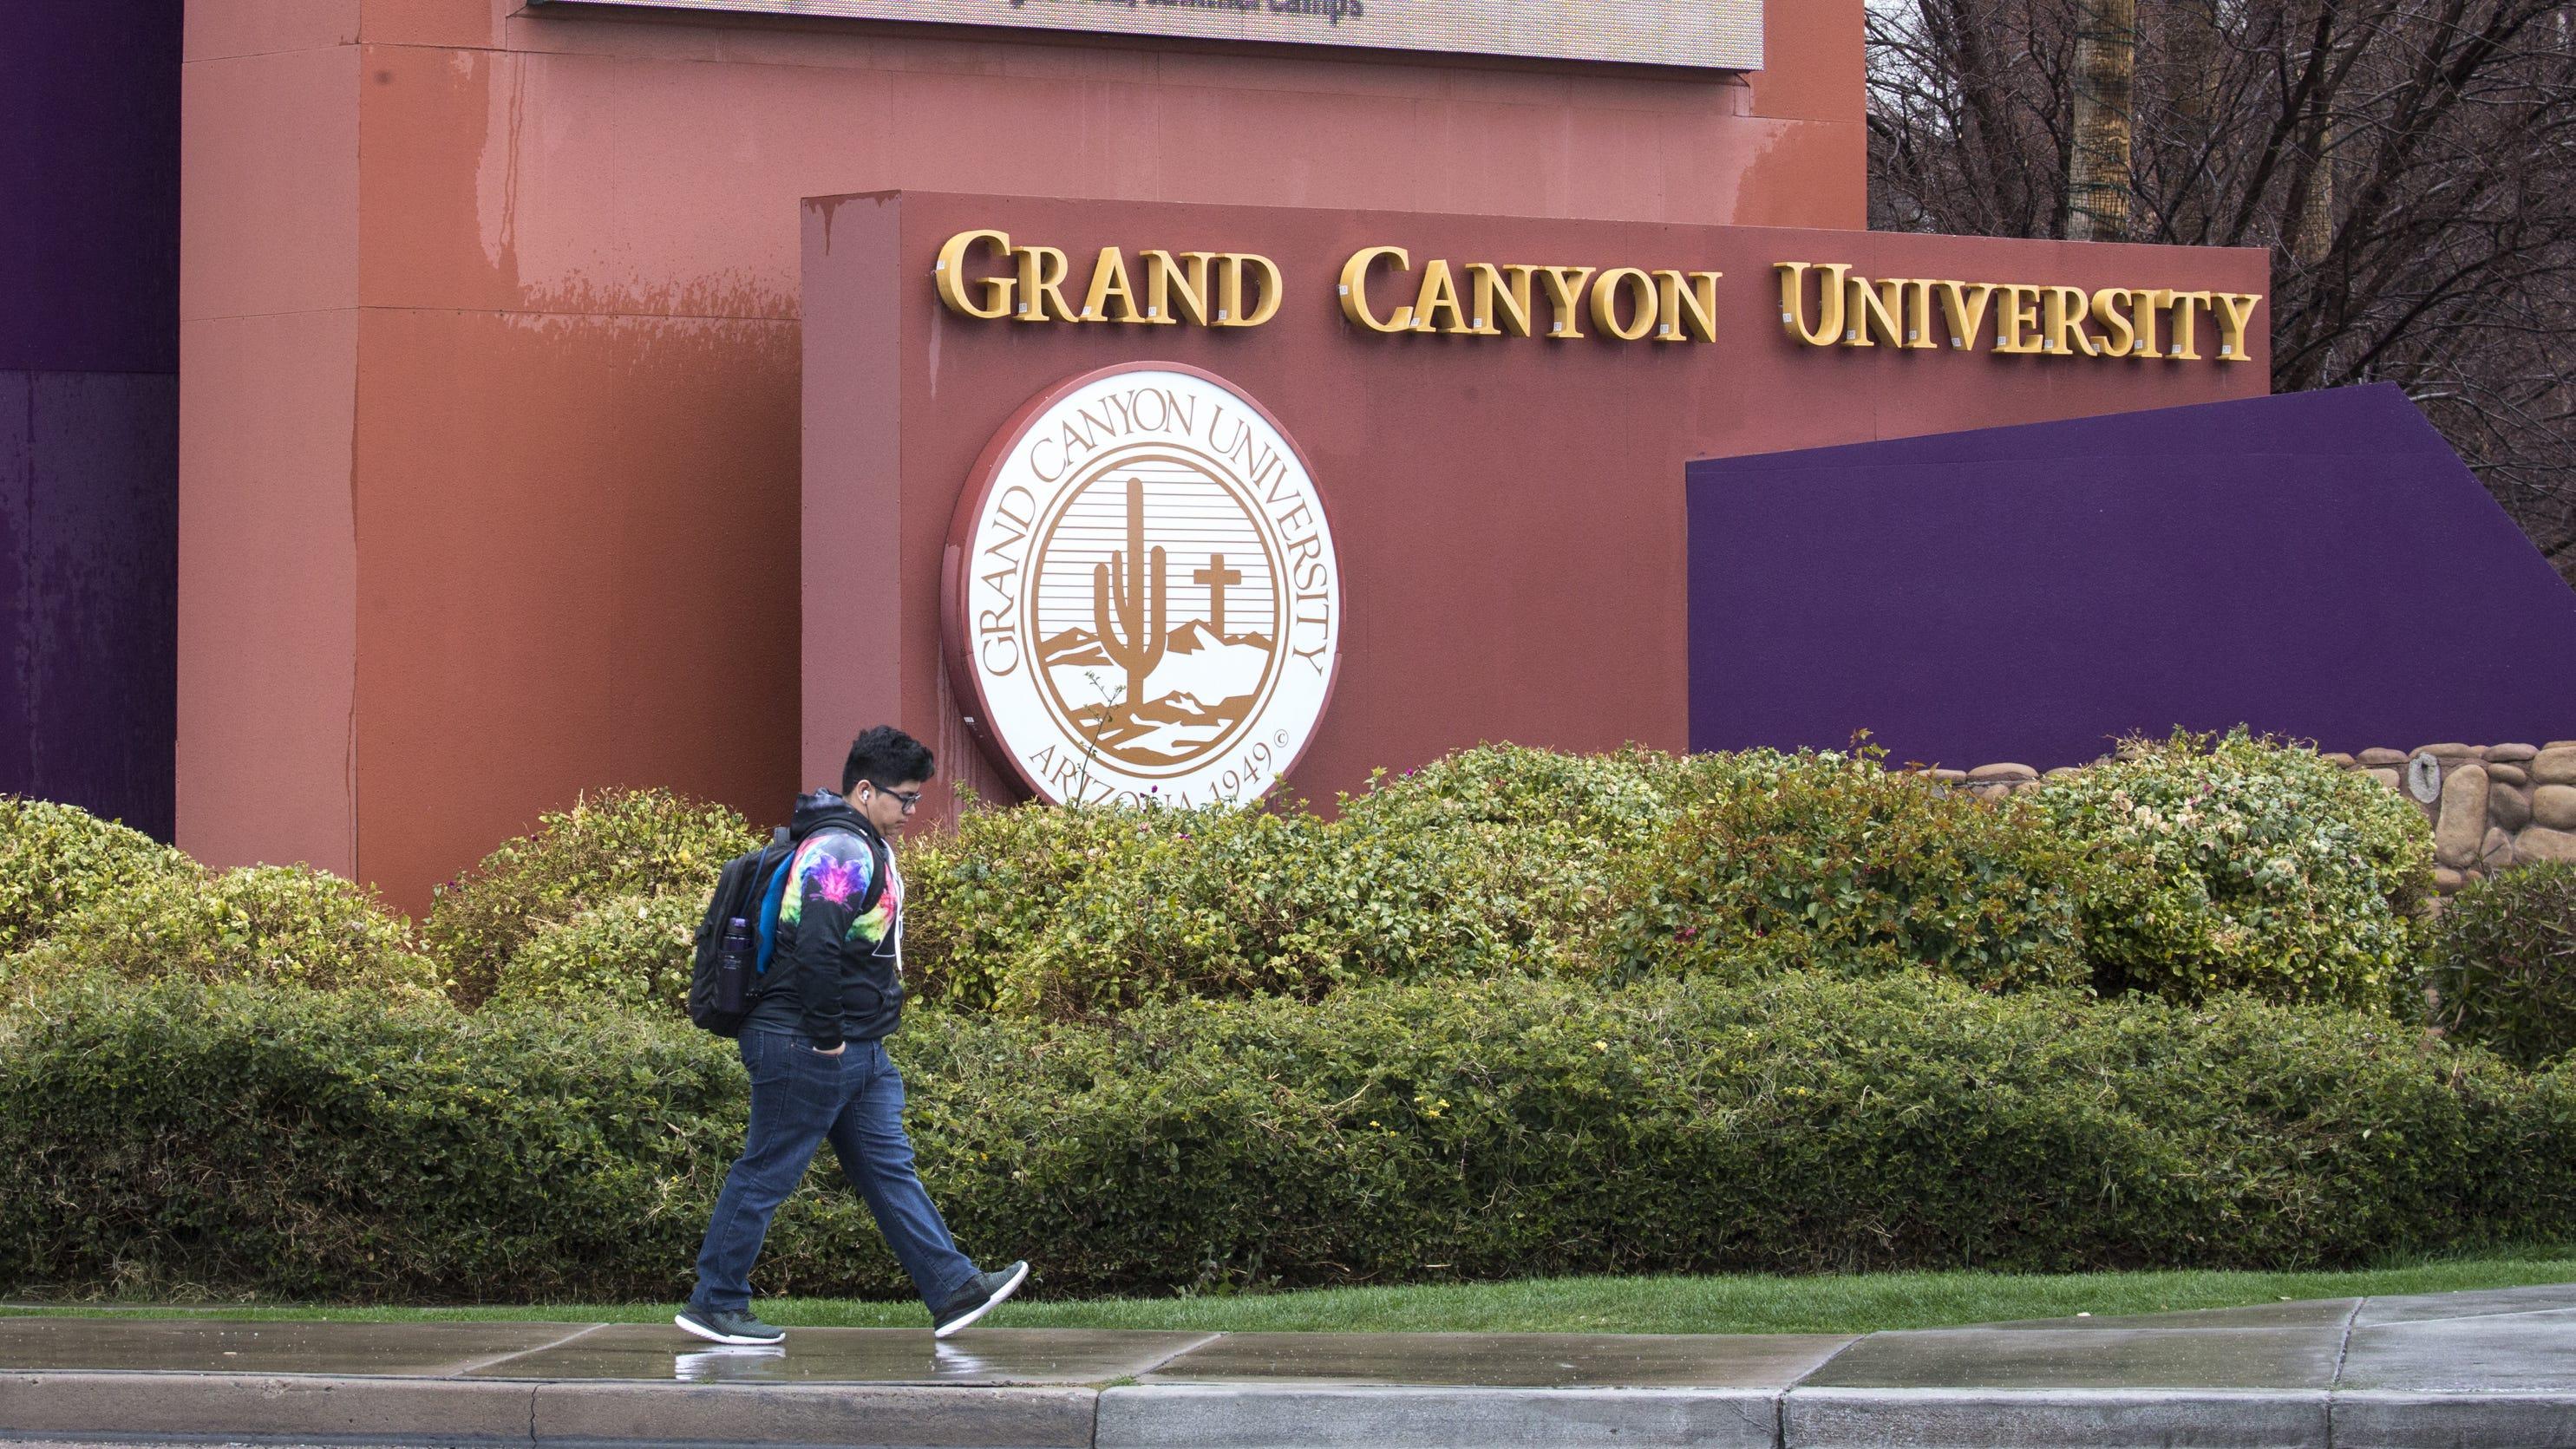 Gcu Academic Calendar 2021-2022 Grand Canyon University, Maricopa County Community Colleges delay